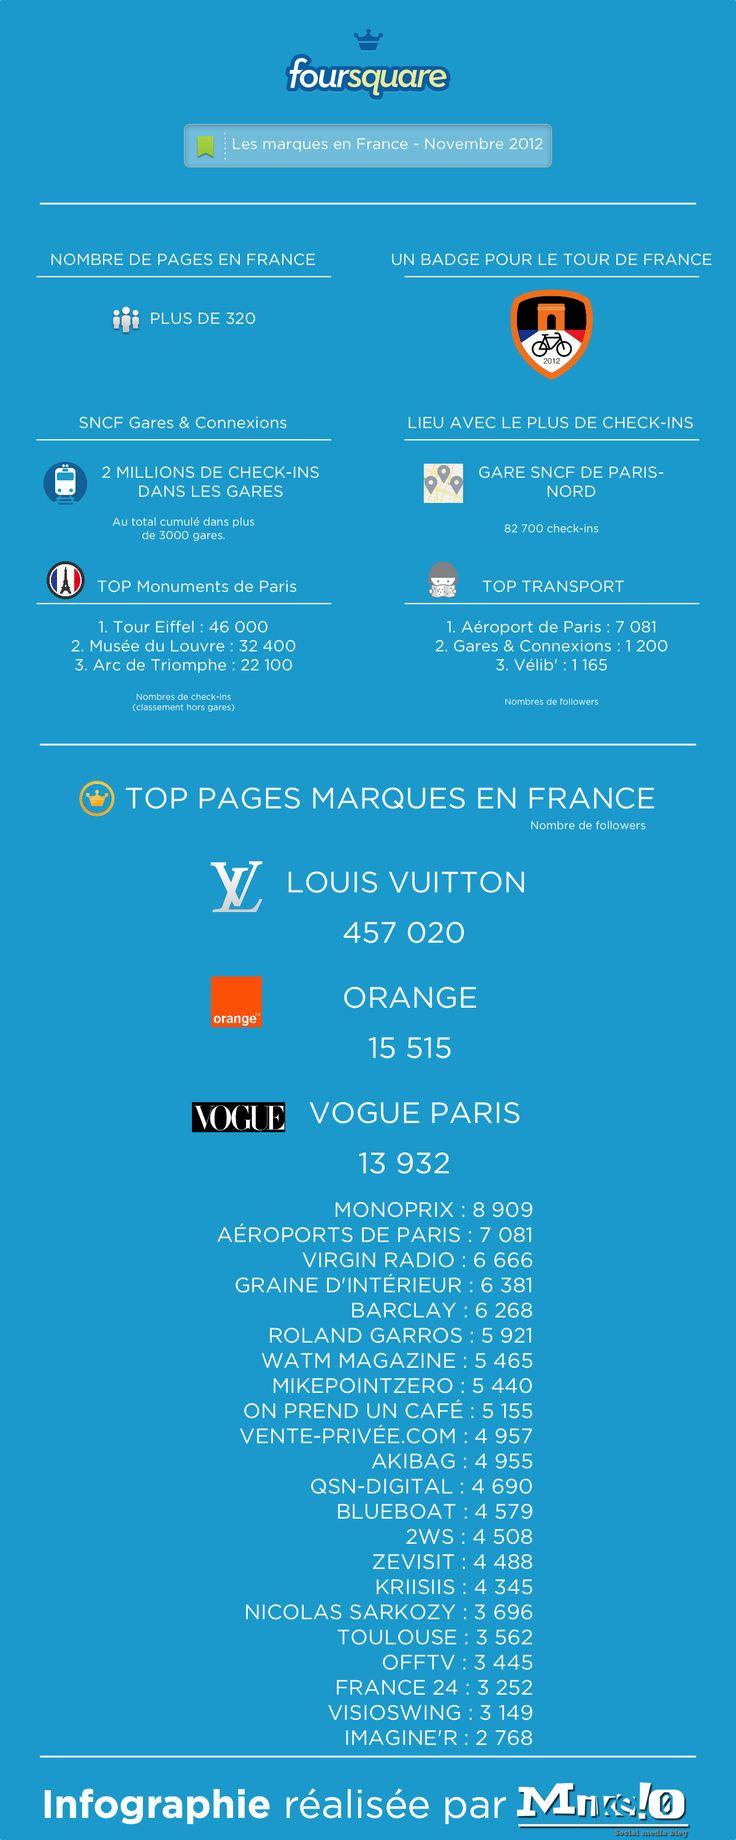 Foursquare infographie Page marque Novembre 2012 V2b